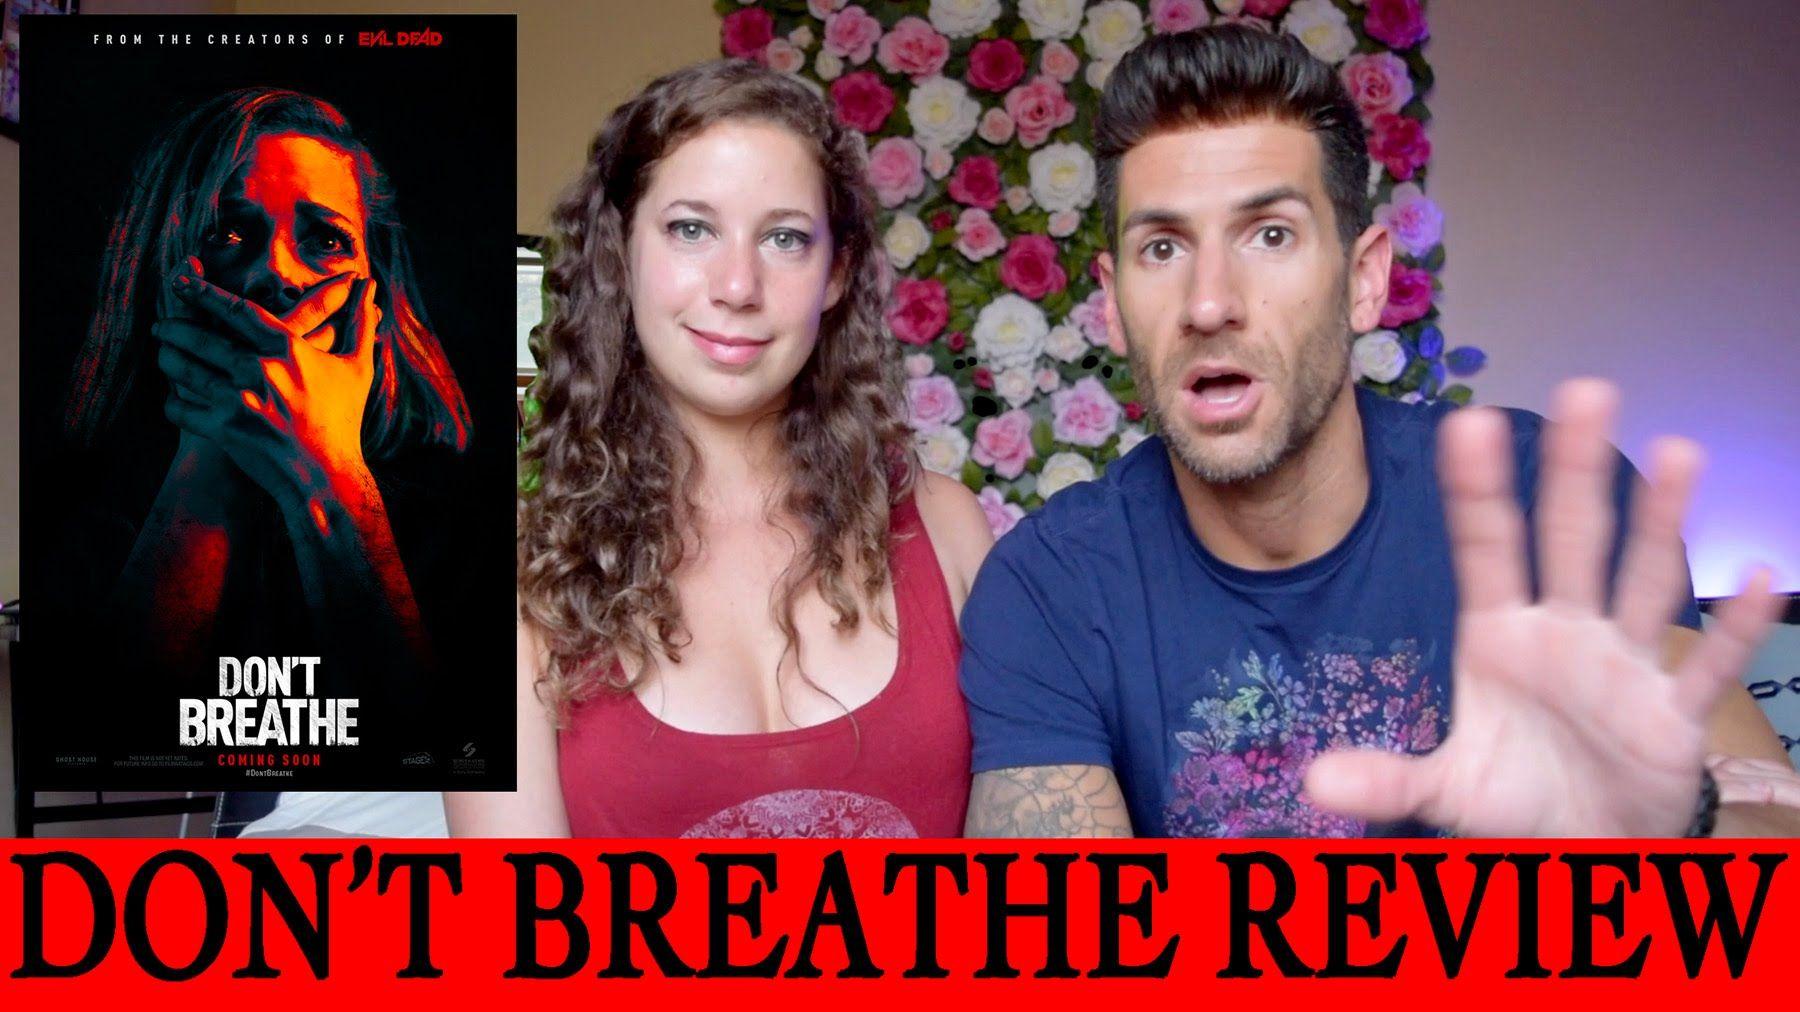 Don't Breathe - Movie Review | Dont breathe movie, Breathe ...